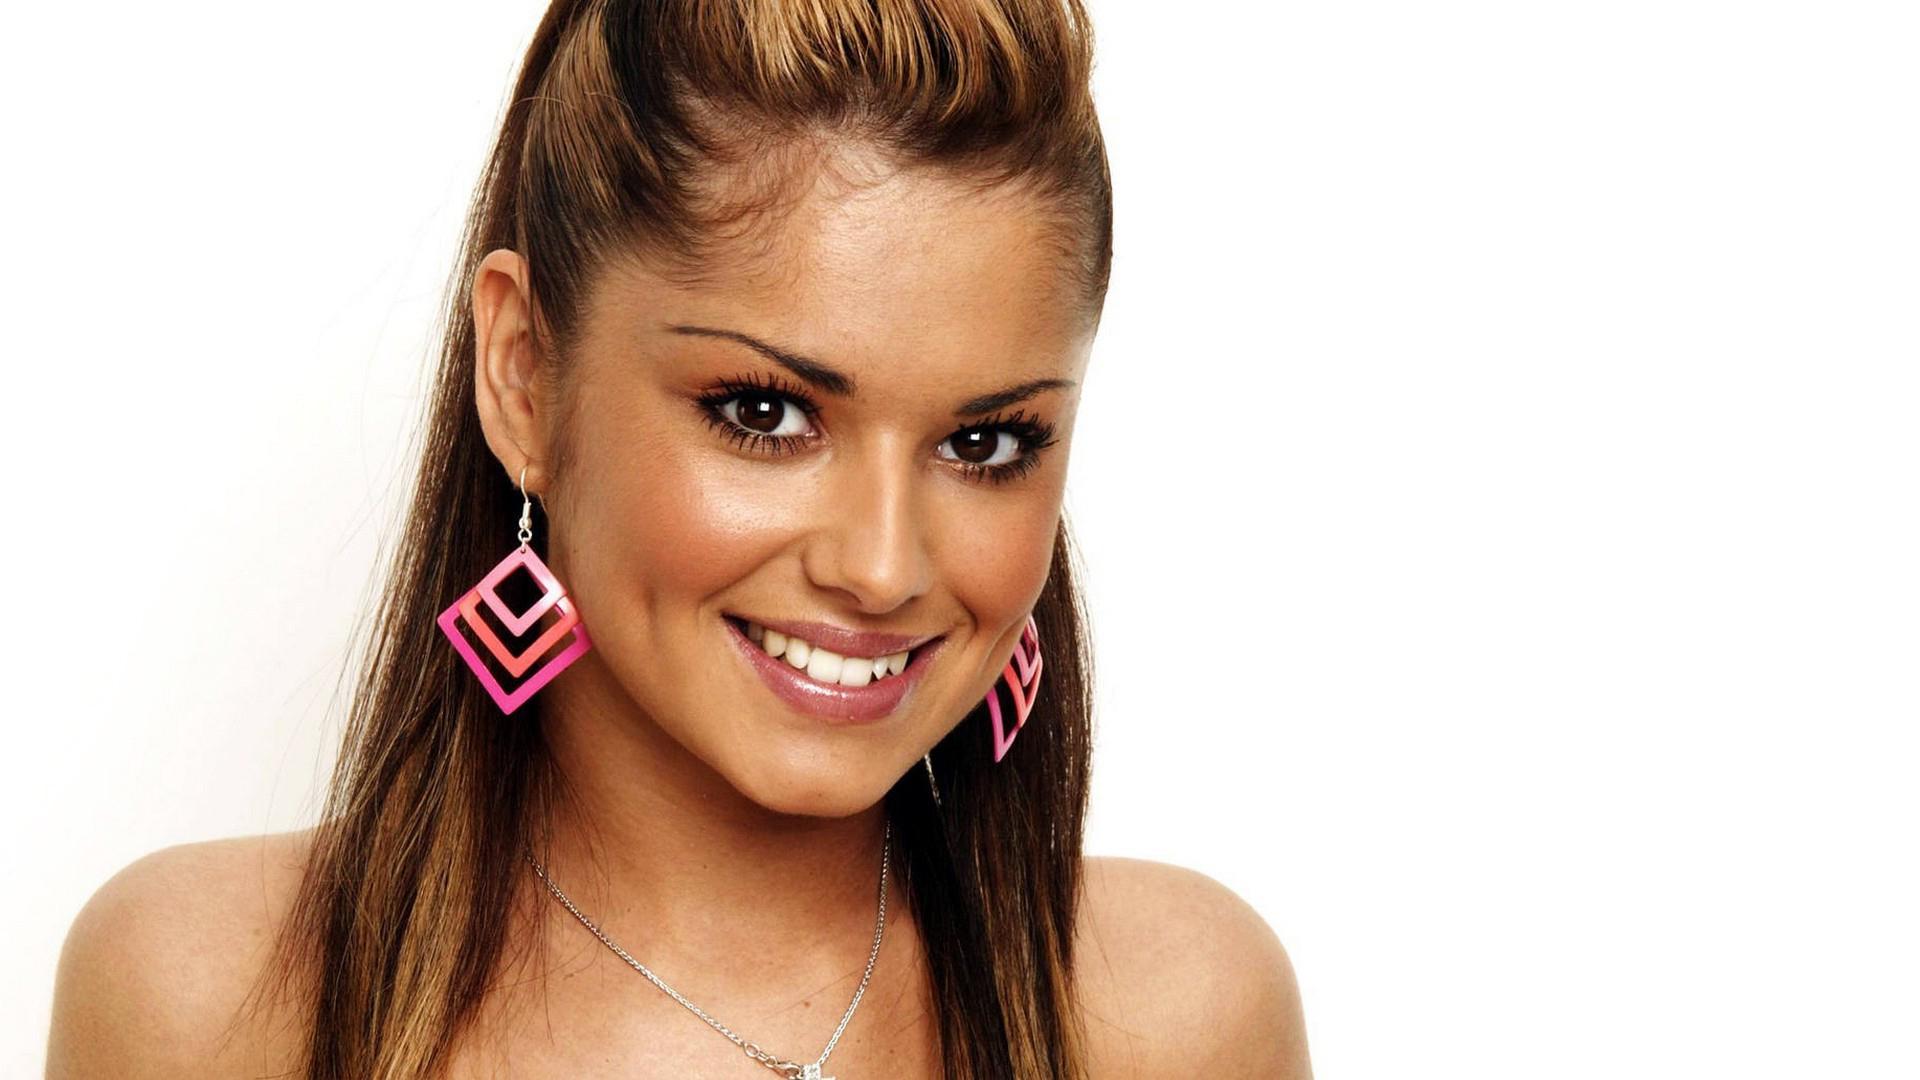 Cheryl Cole Widescreen